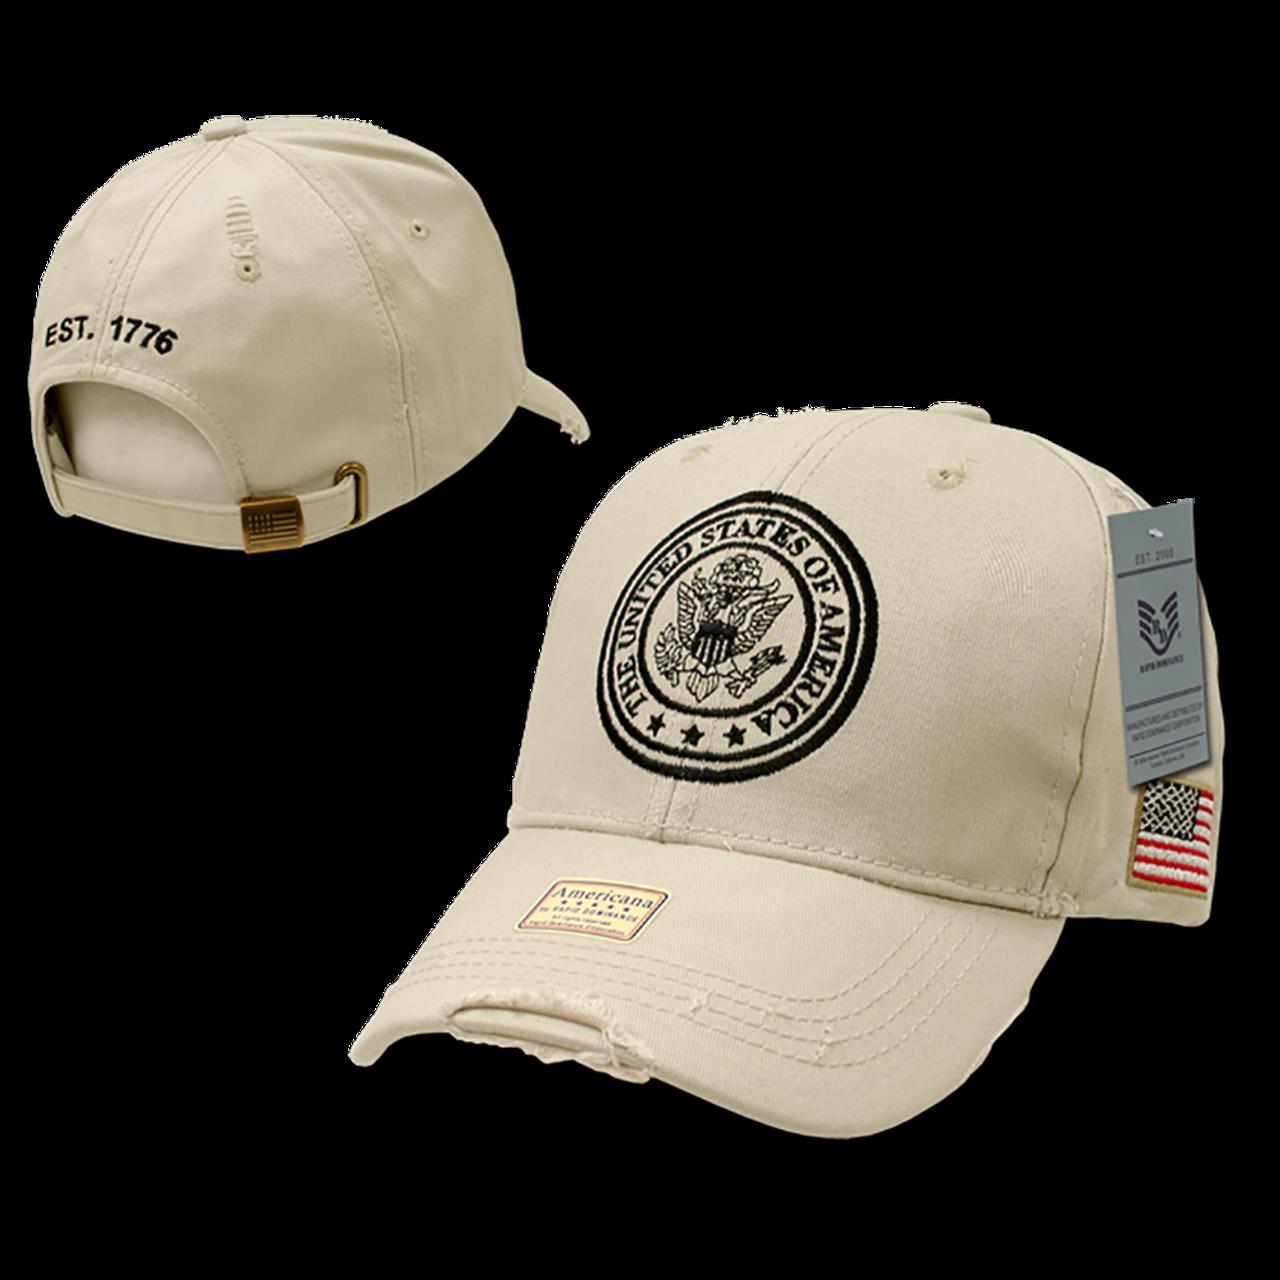 A01 - USA Cap - Vintage - Stone